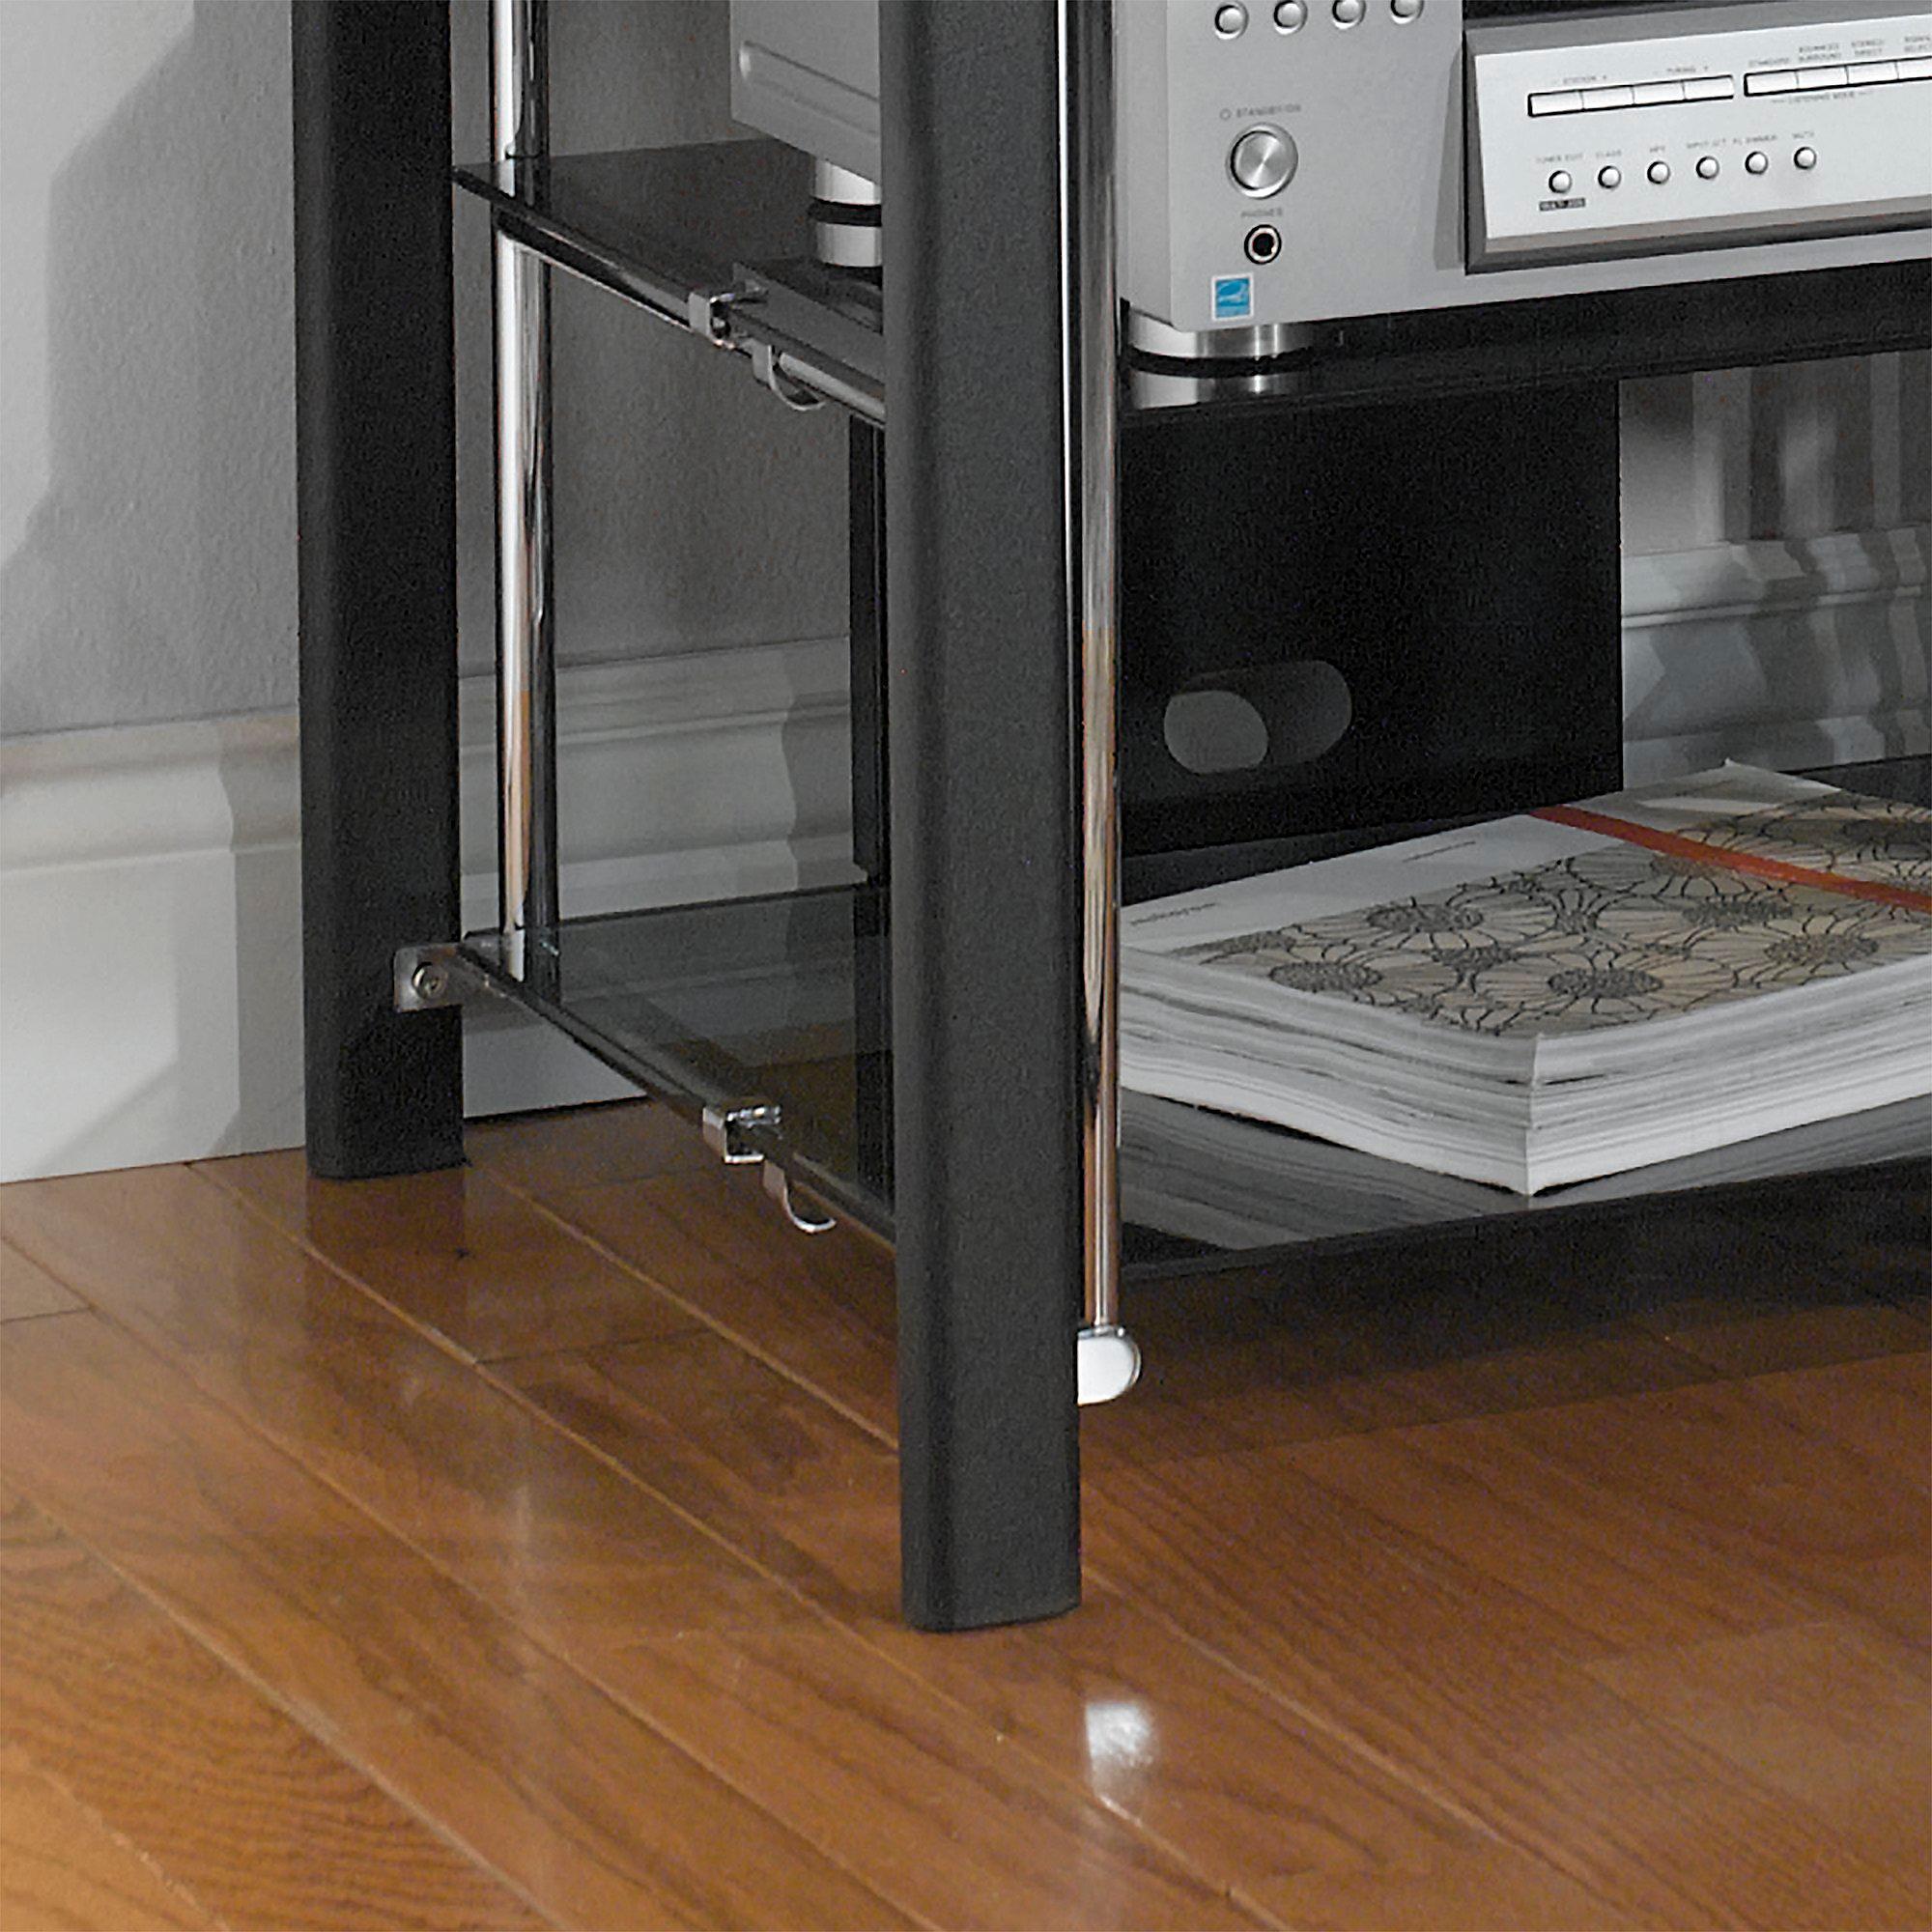 Media Stand Black Chrome Stereo Cd Dvd Audio Book Rack